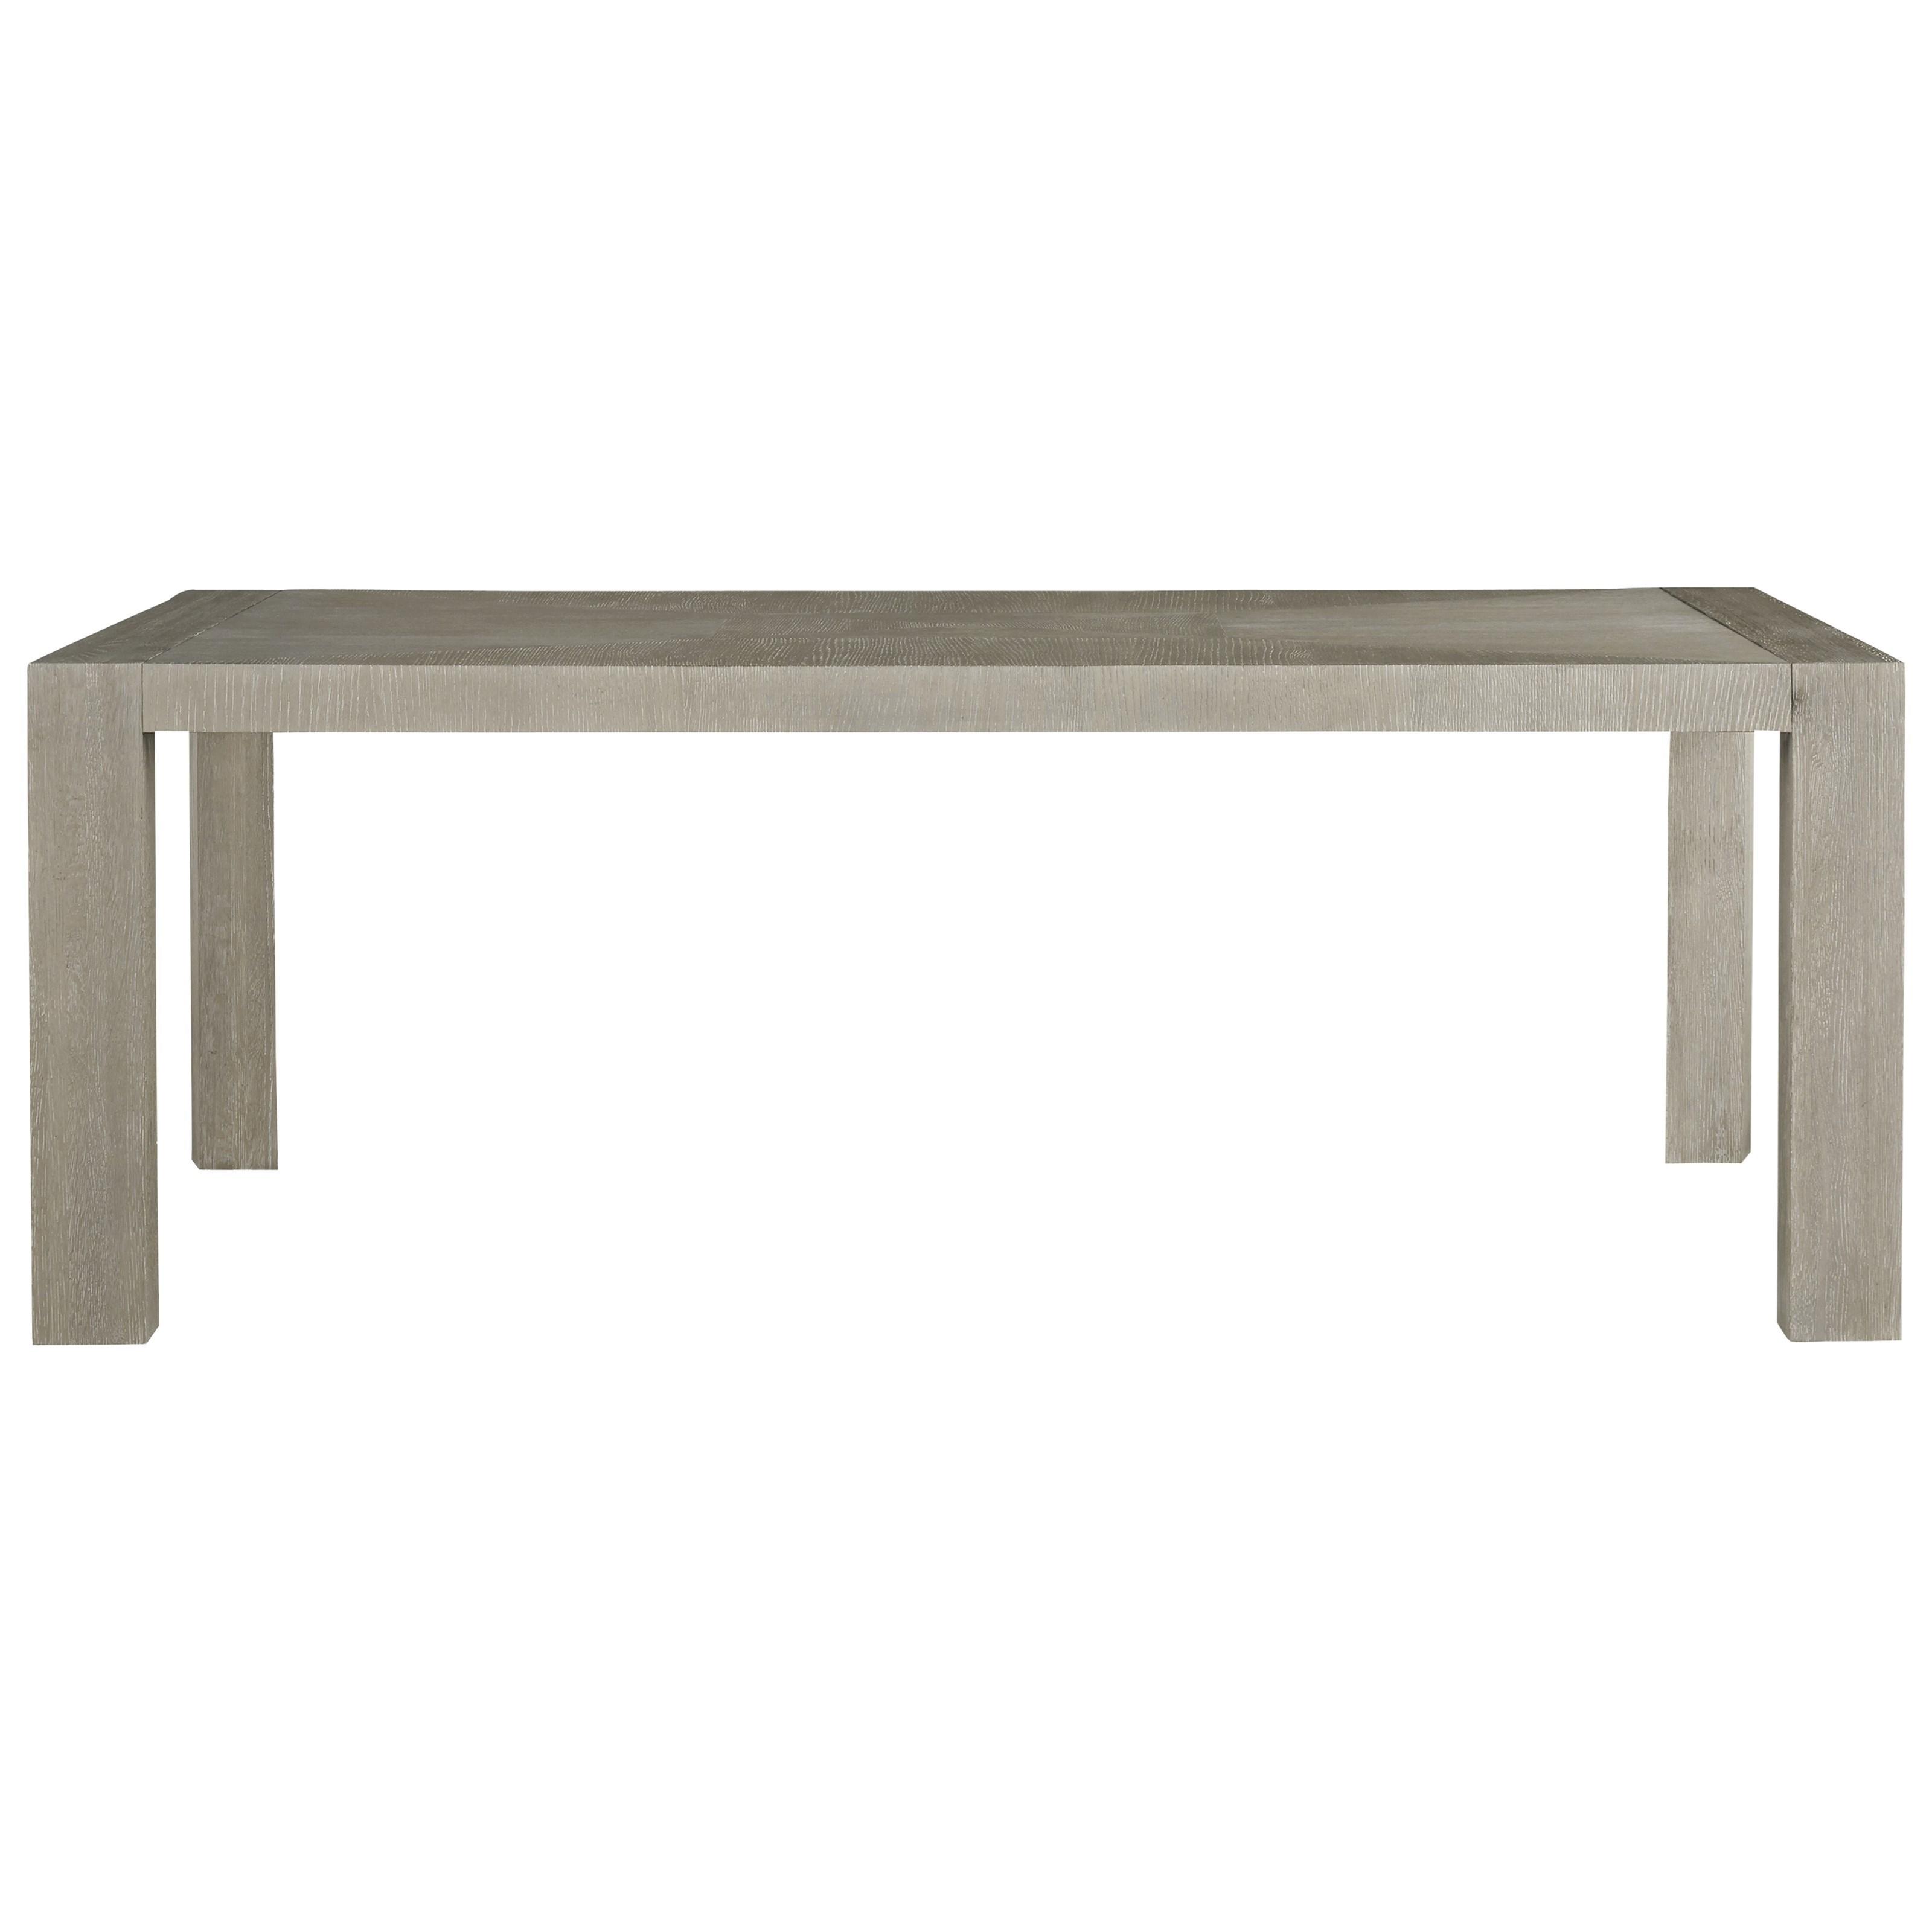 Wittman & Co. Lexa Langston Dining Table - Item Number: 645753